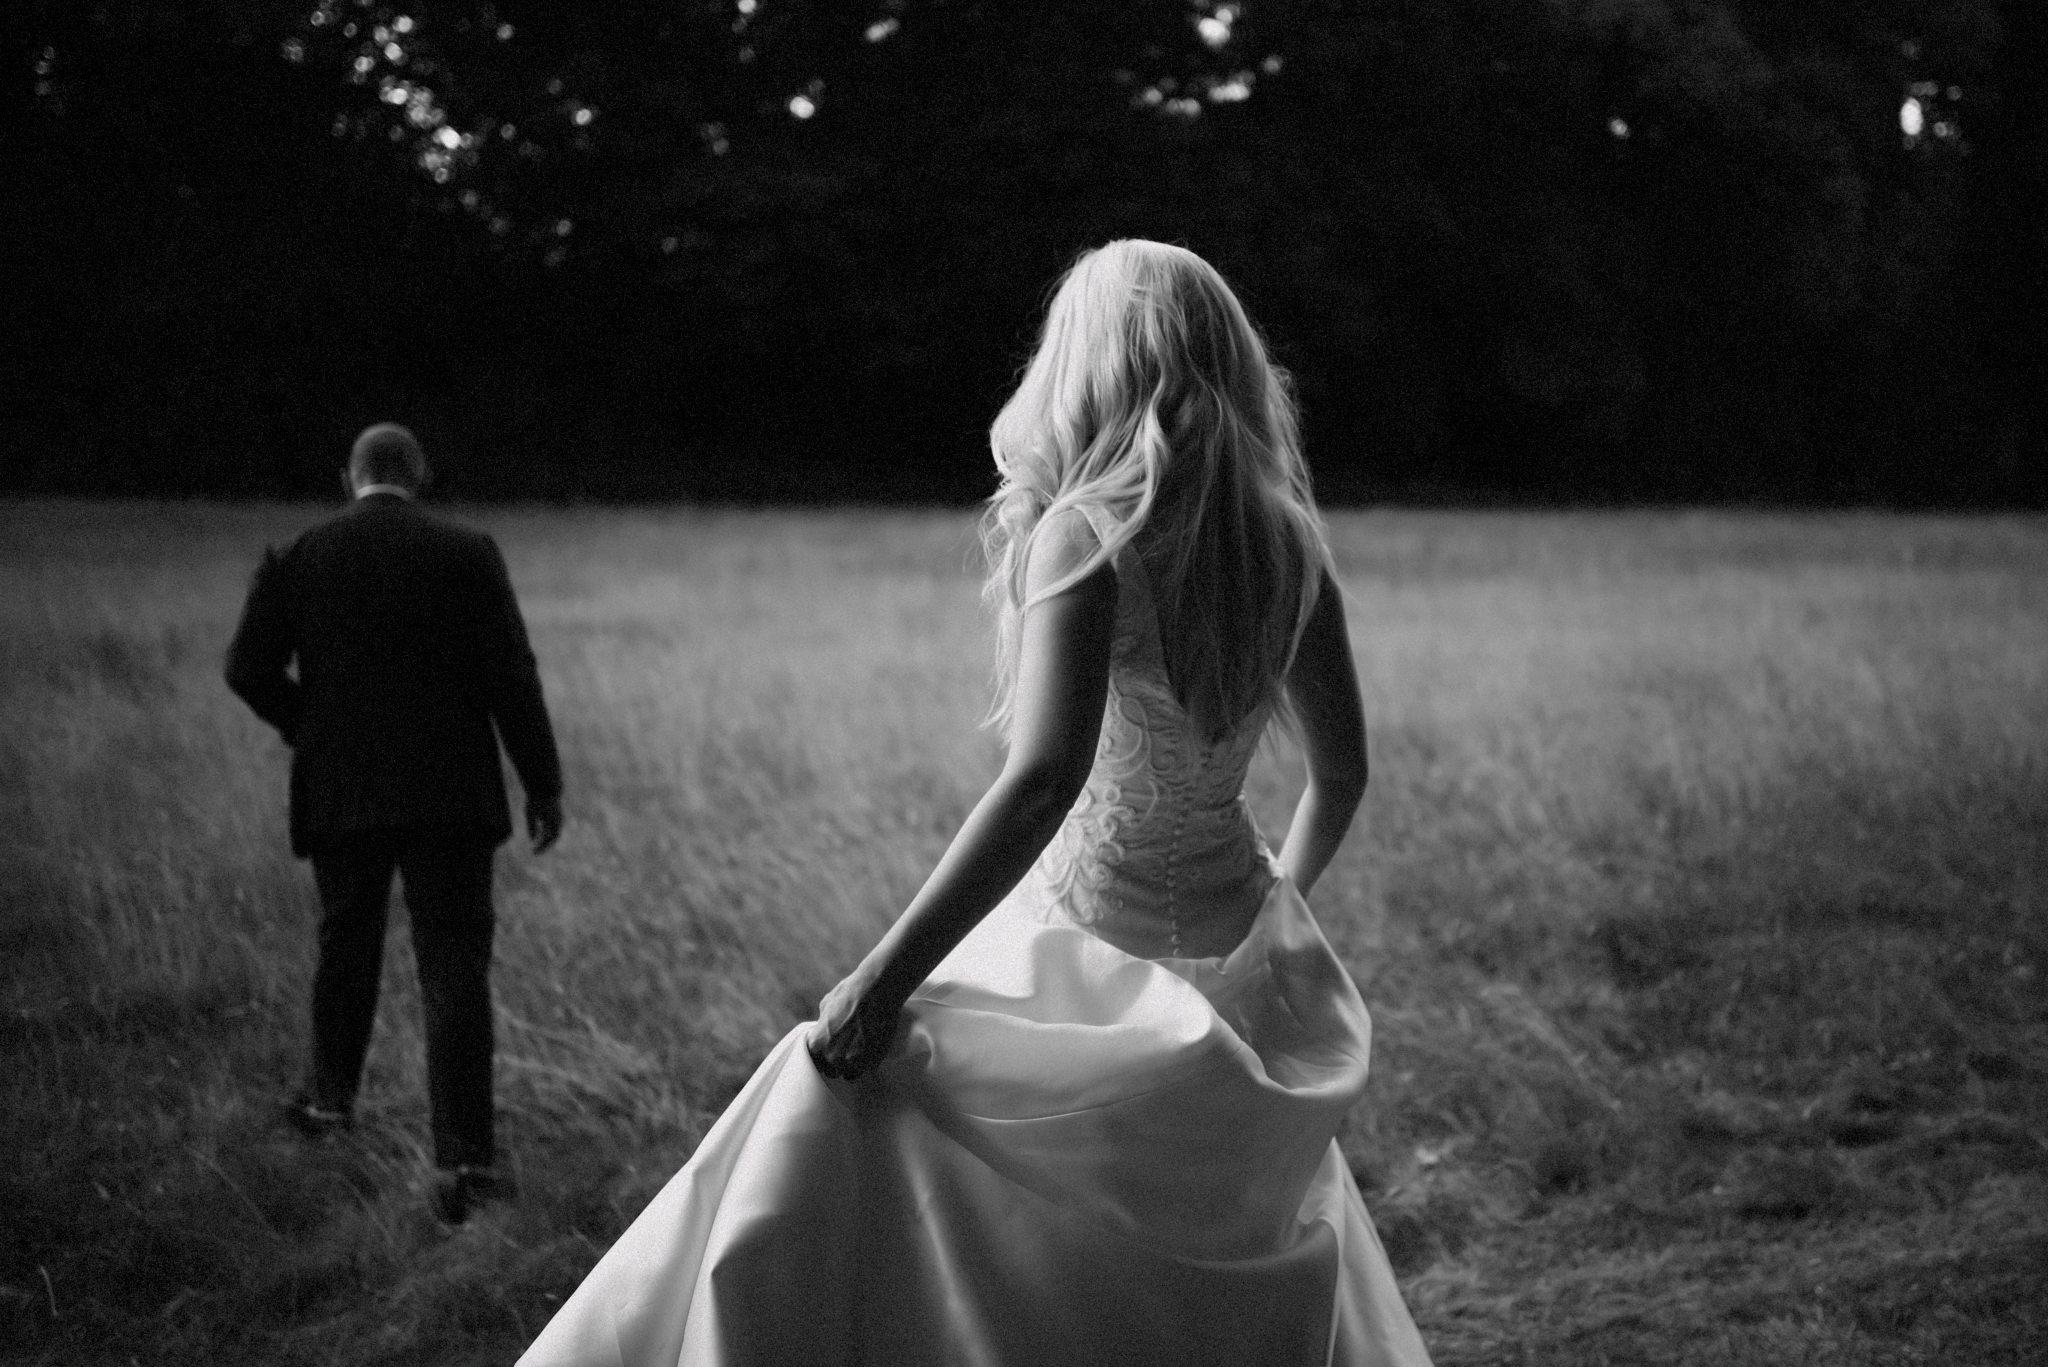 Bruidsfotografie Buitenplaats Sparrendaal - Naomi van der Kraan 0075.jpg